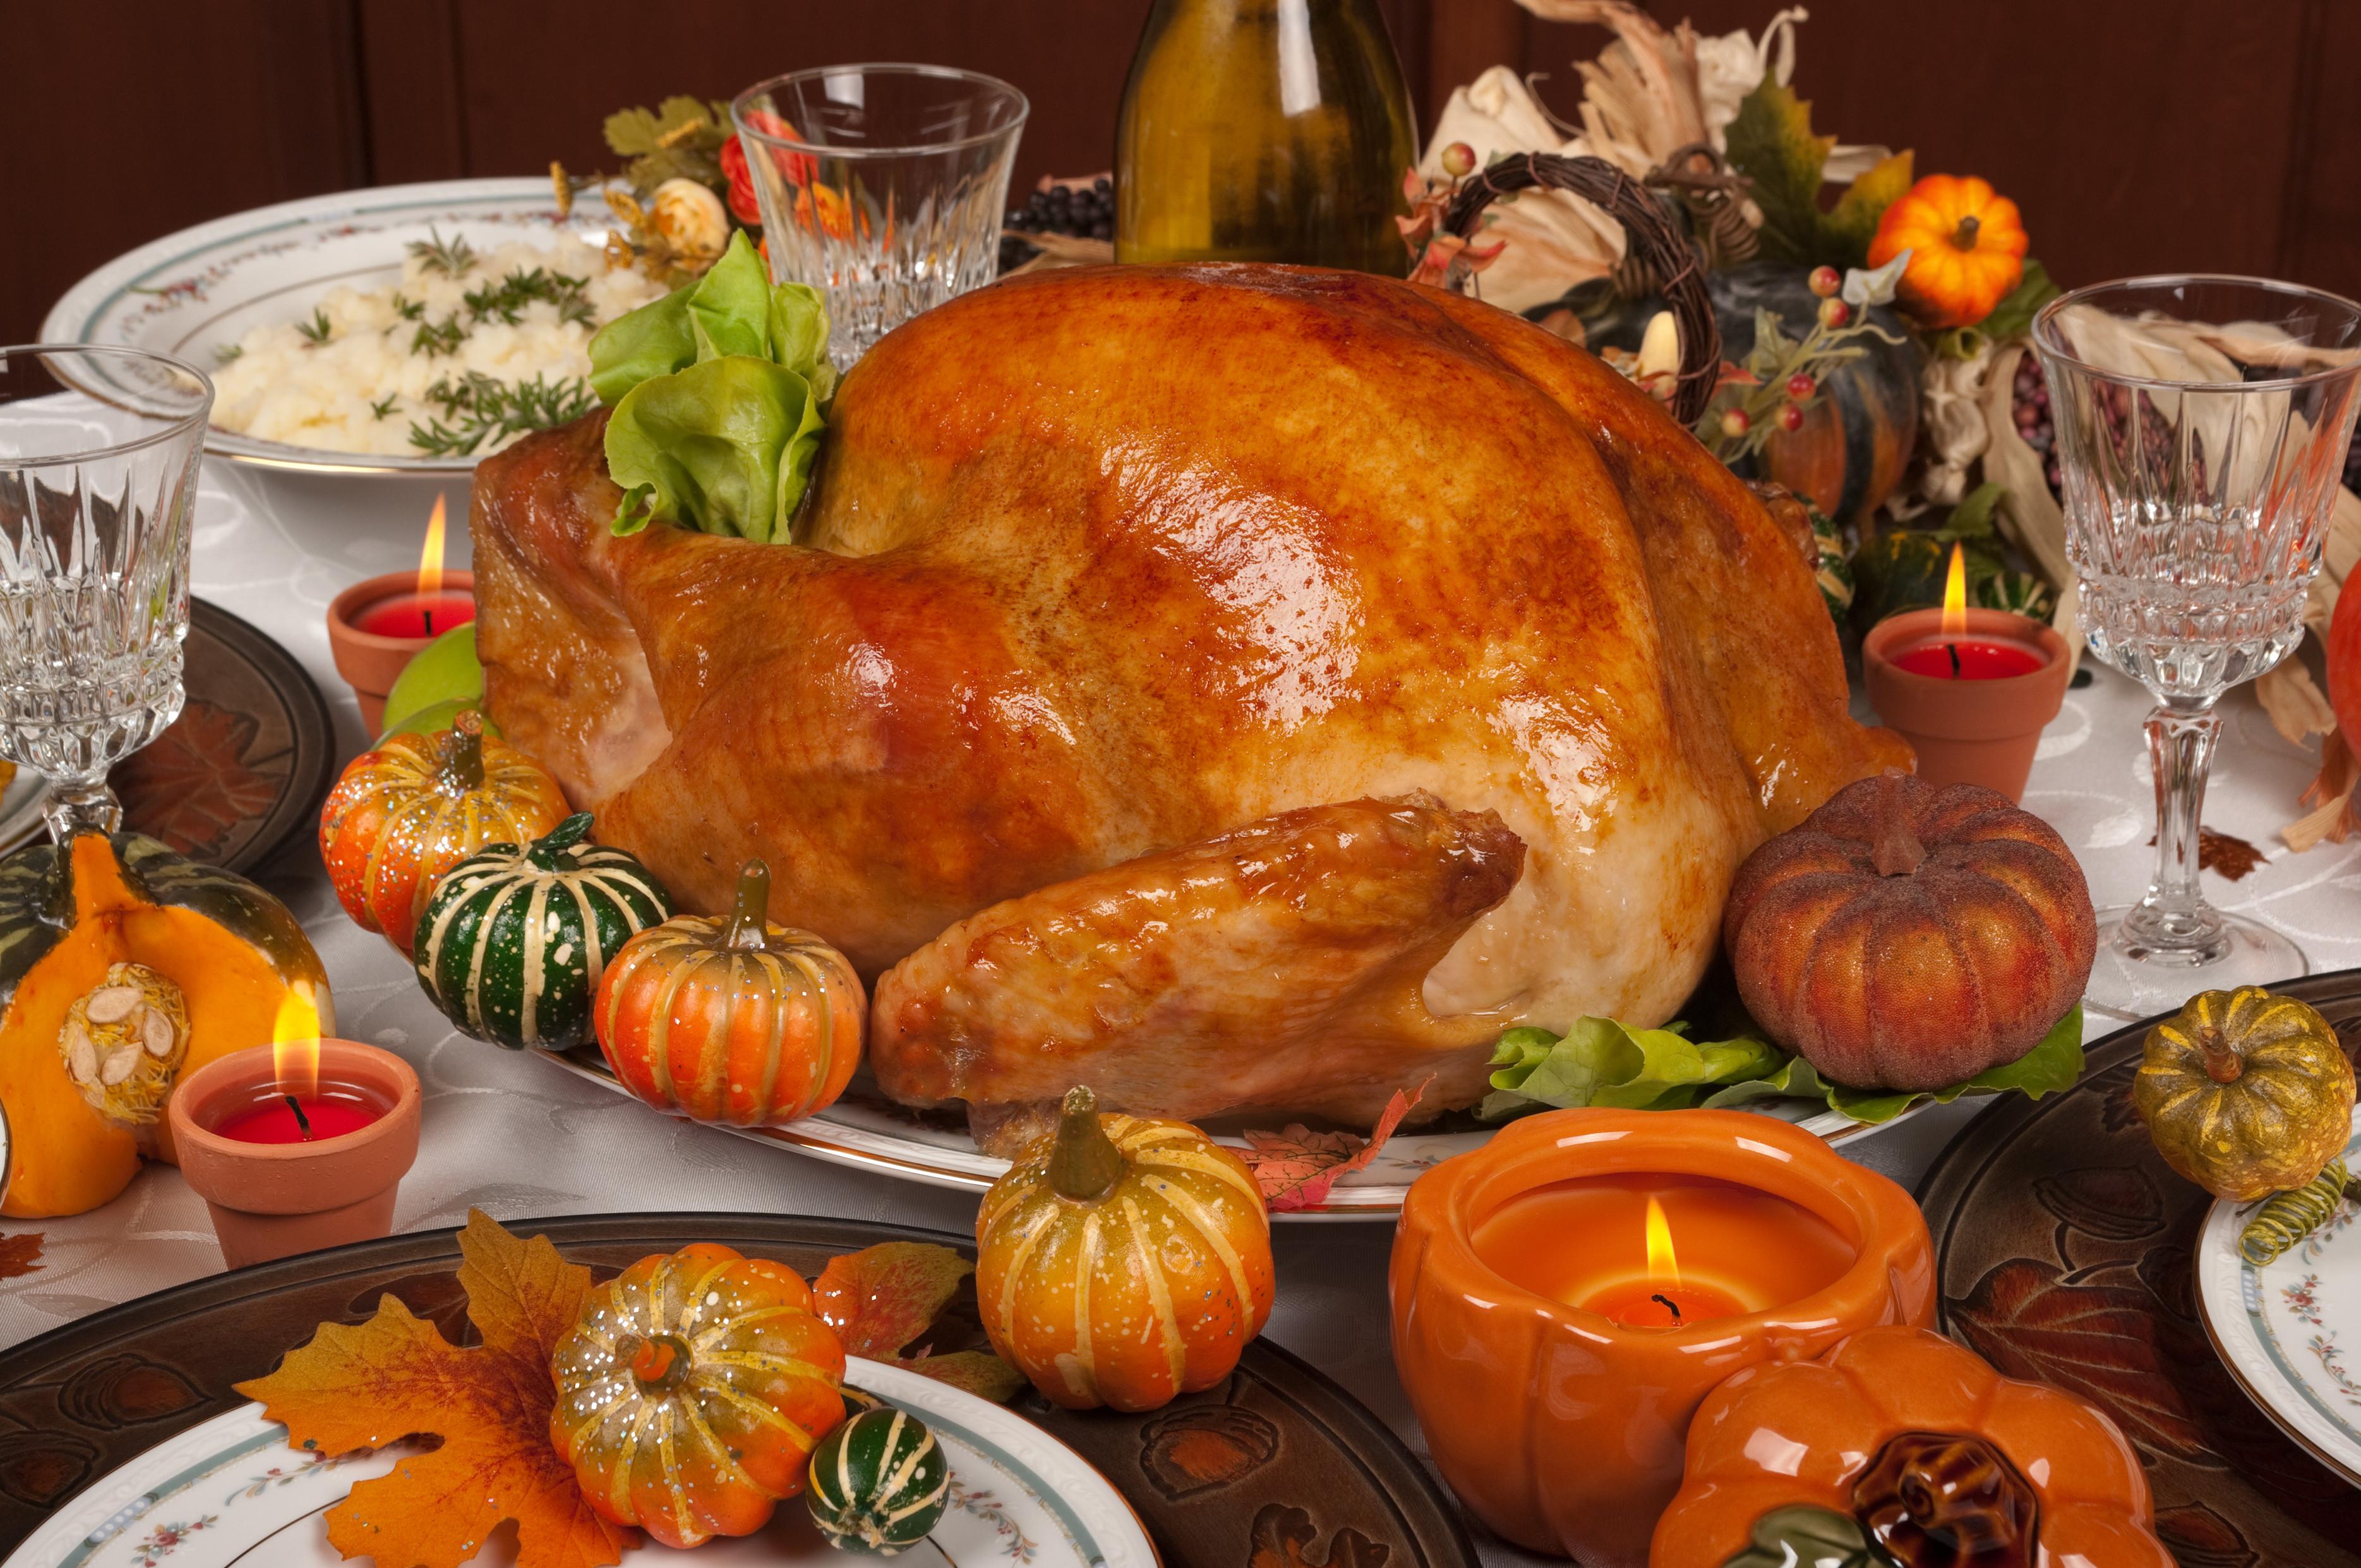 Turkey Pics Thanksgiving  English Scholar Examines Symbolism of Thanksgiving